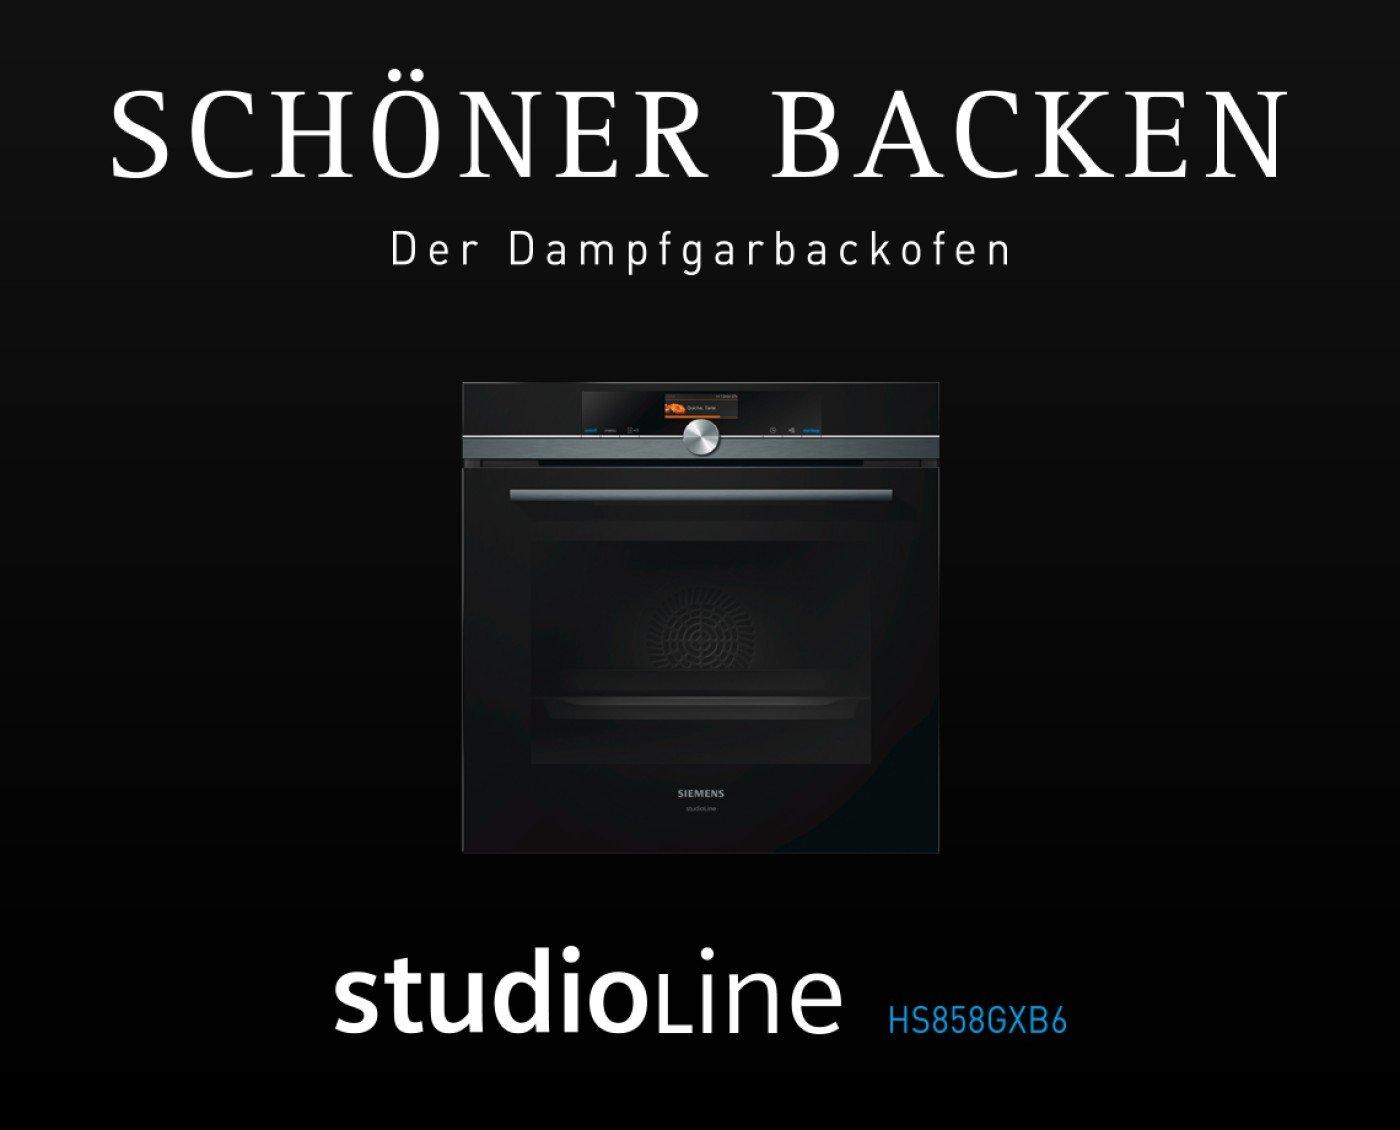 Studioline Dampfgarbackofen HS858GXB6